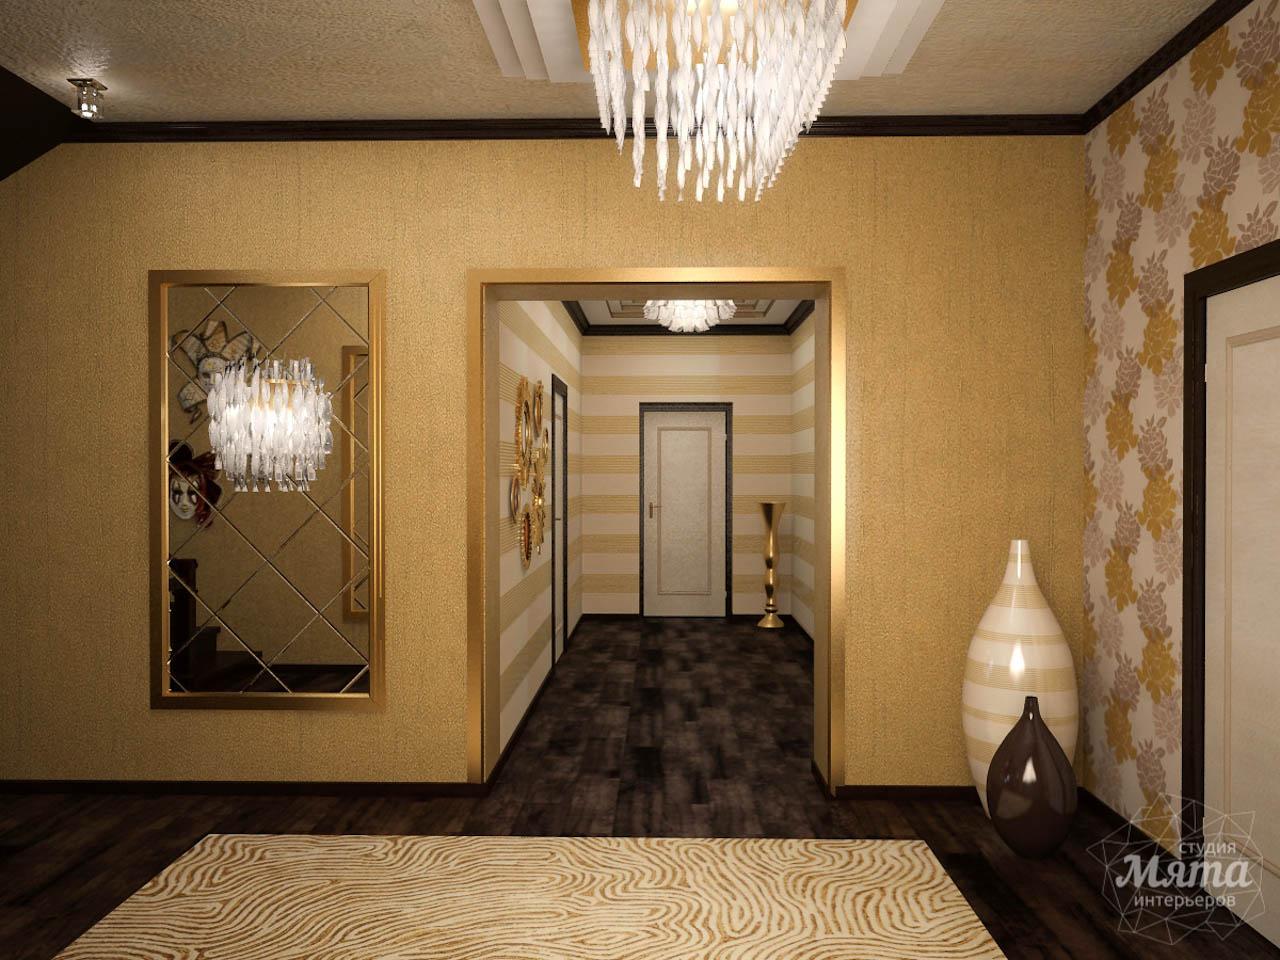 Дизайн интерьера коттеджа по ул. Ландышевая 23 img1944640623